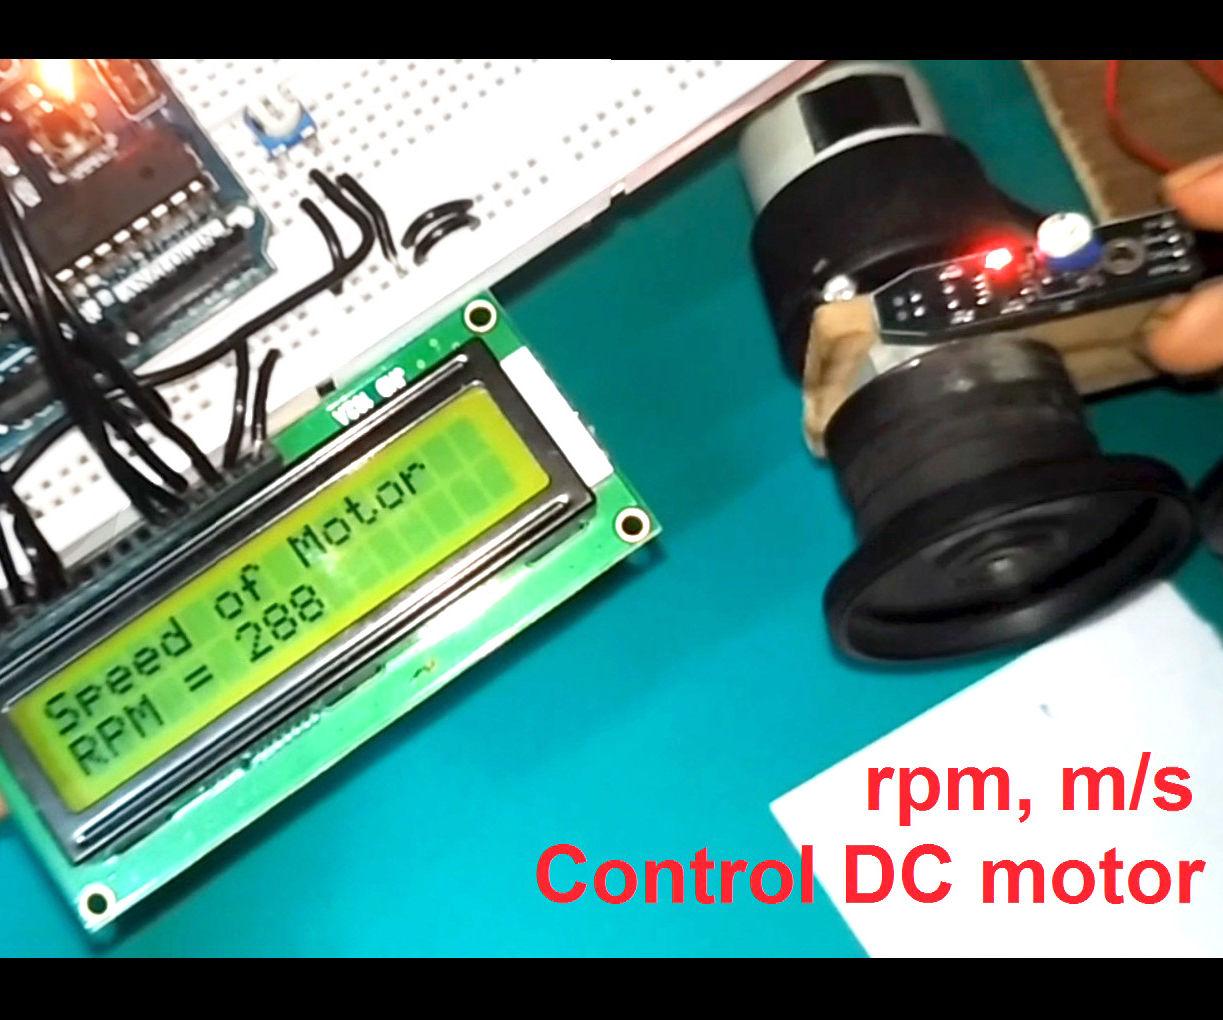 Motor Speed Tester Using Arduino & IR Sensor: 6 Steps